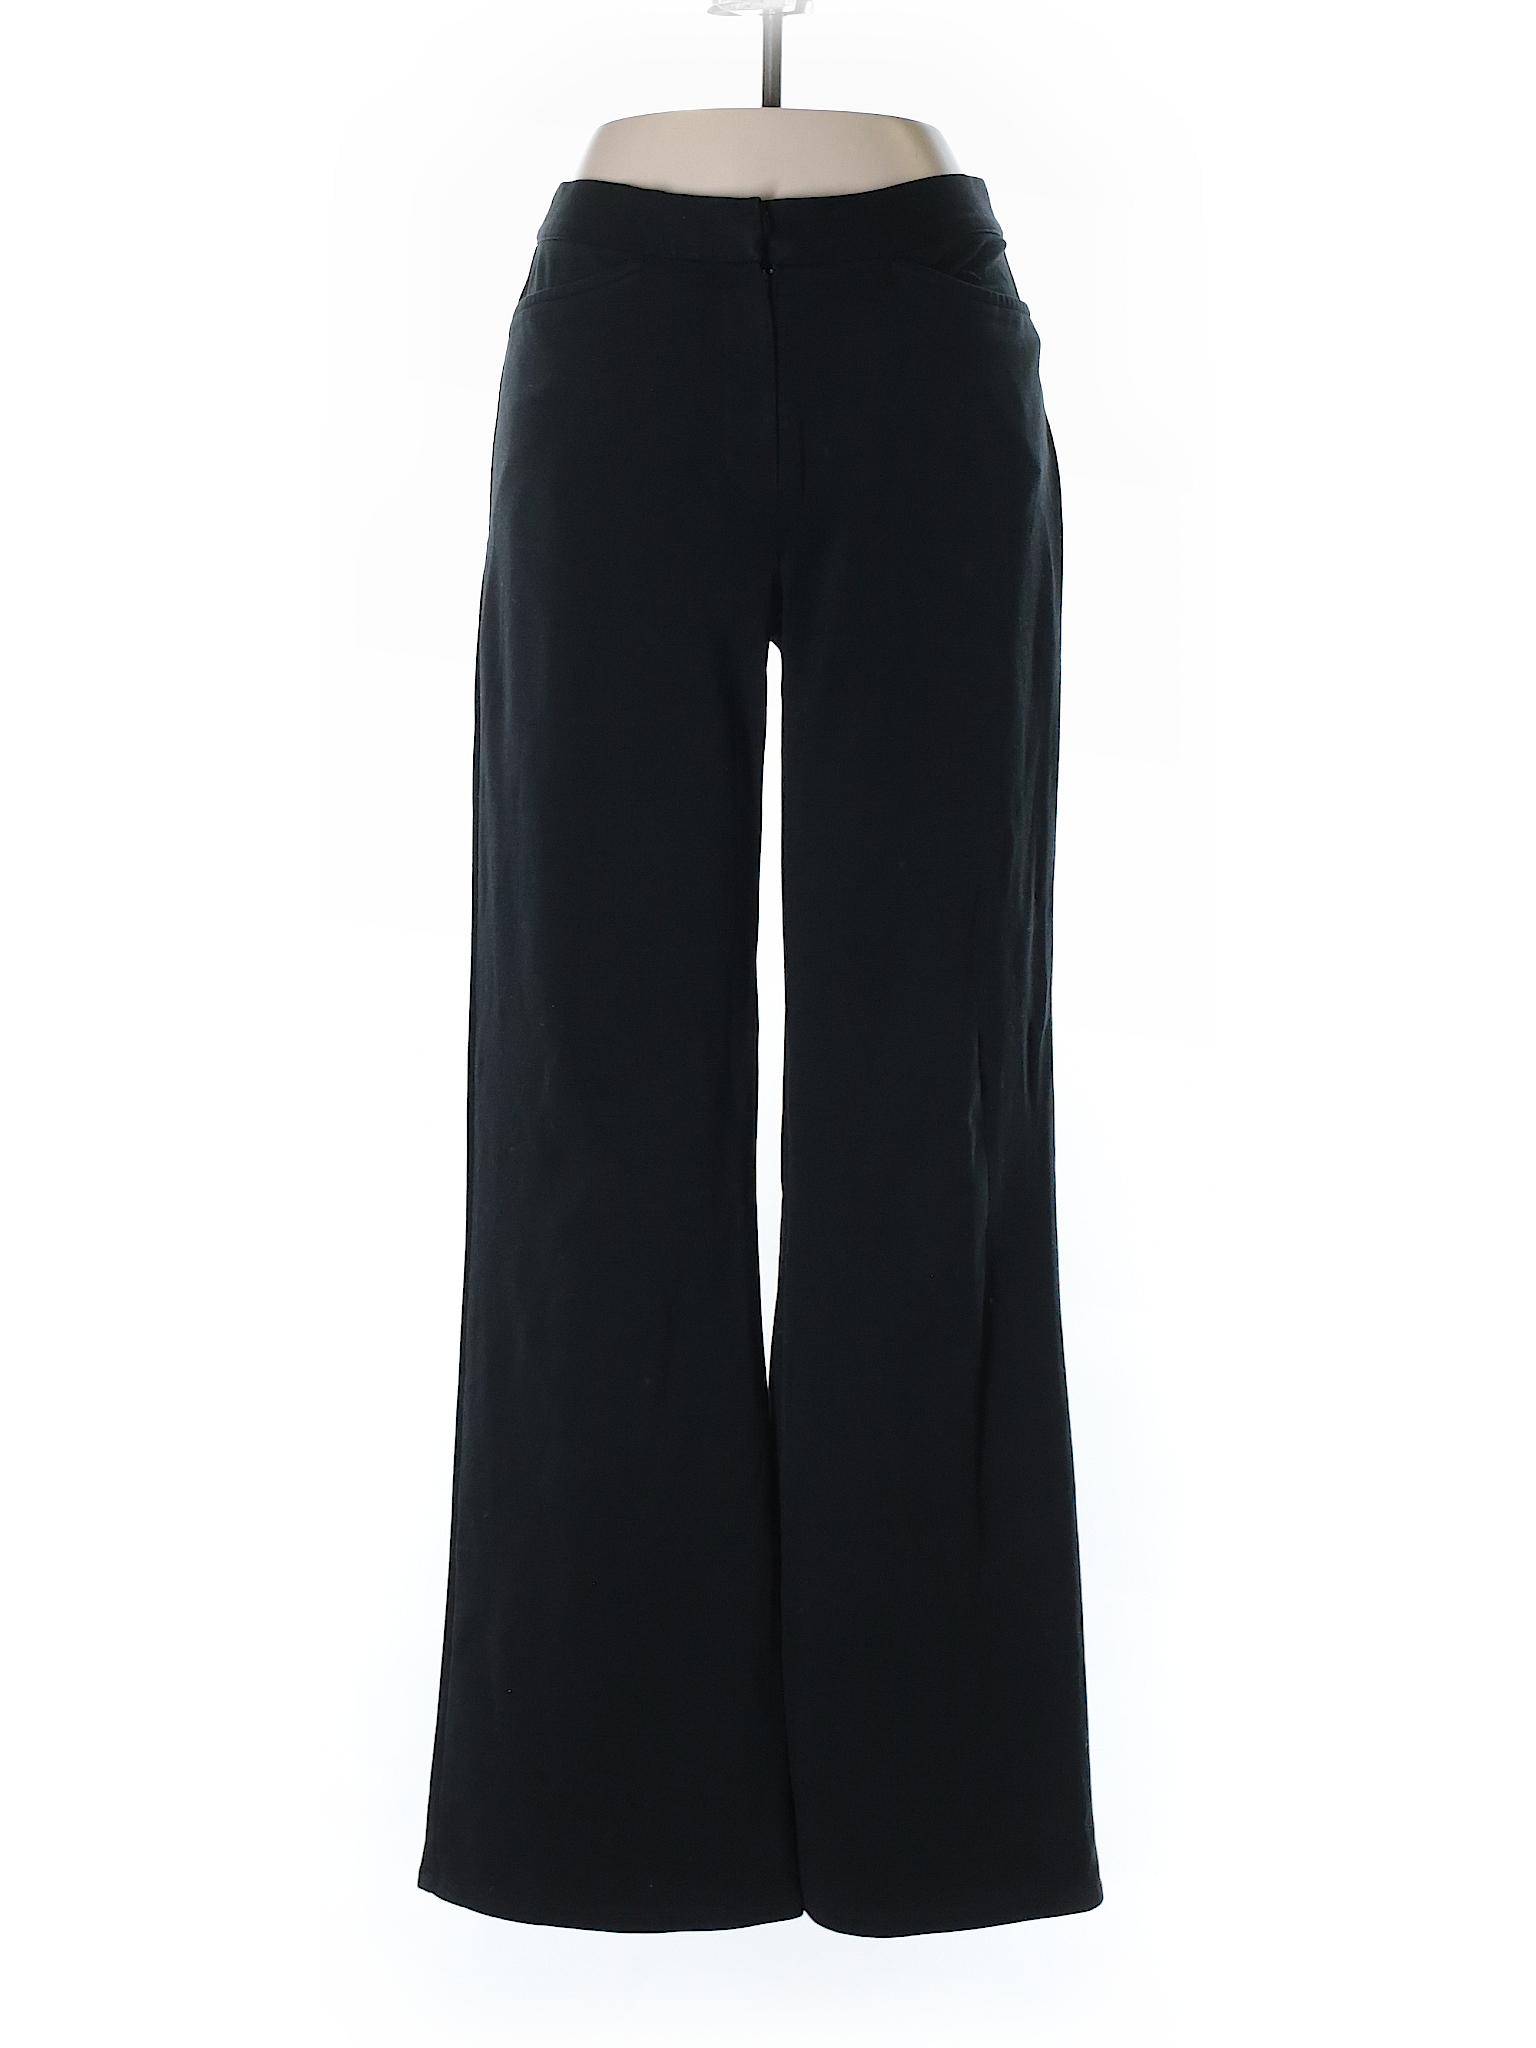 Dress Boutique Winter Pants amp;co Ny Bw8vp8qY